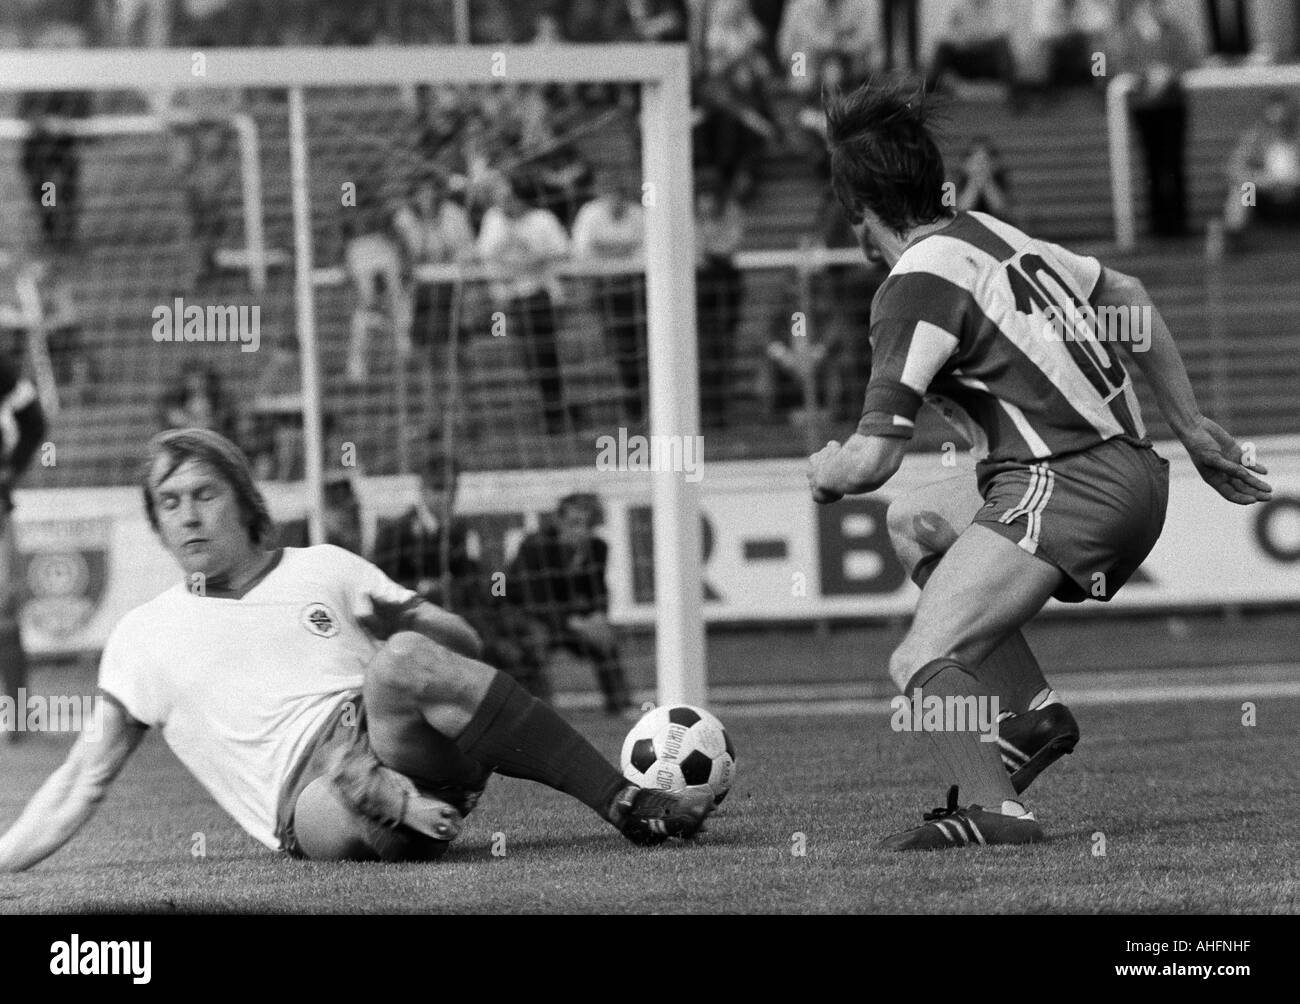 football, Bundesliga, 1971/1972, Rot-Weiss Oberhausen versus Hertha BSC Berlin 5:2, Niederrhein Stadium in Oberhausen, scene of the match, duel between Lothar Kobluhn (RWO) aground and Lorenz Horr (Berlin) - Stock Image